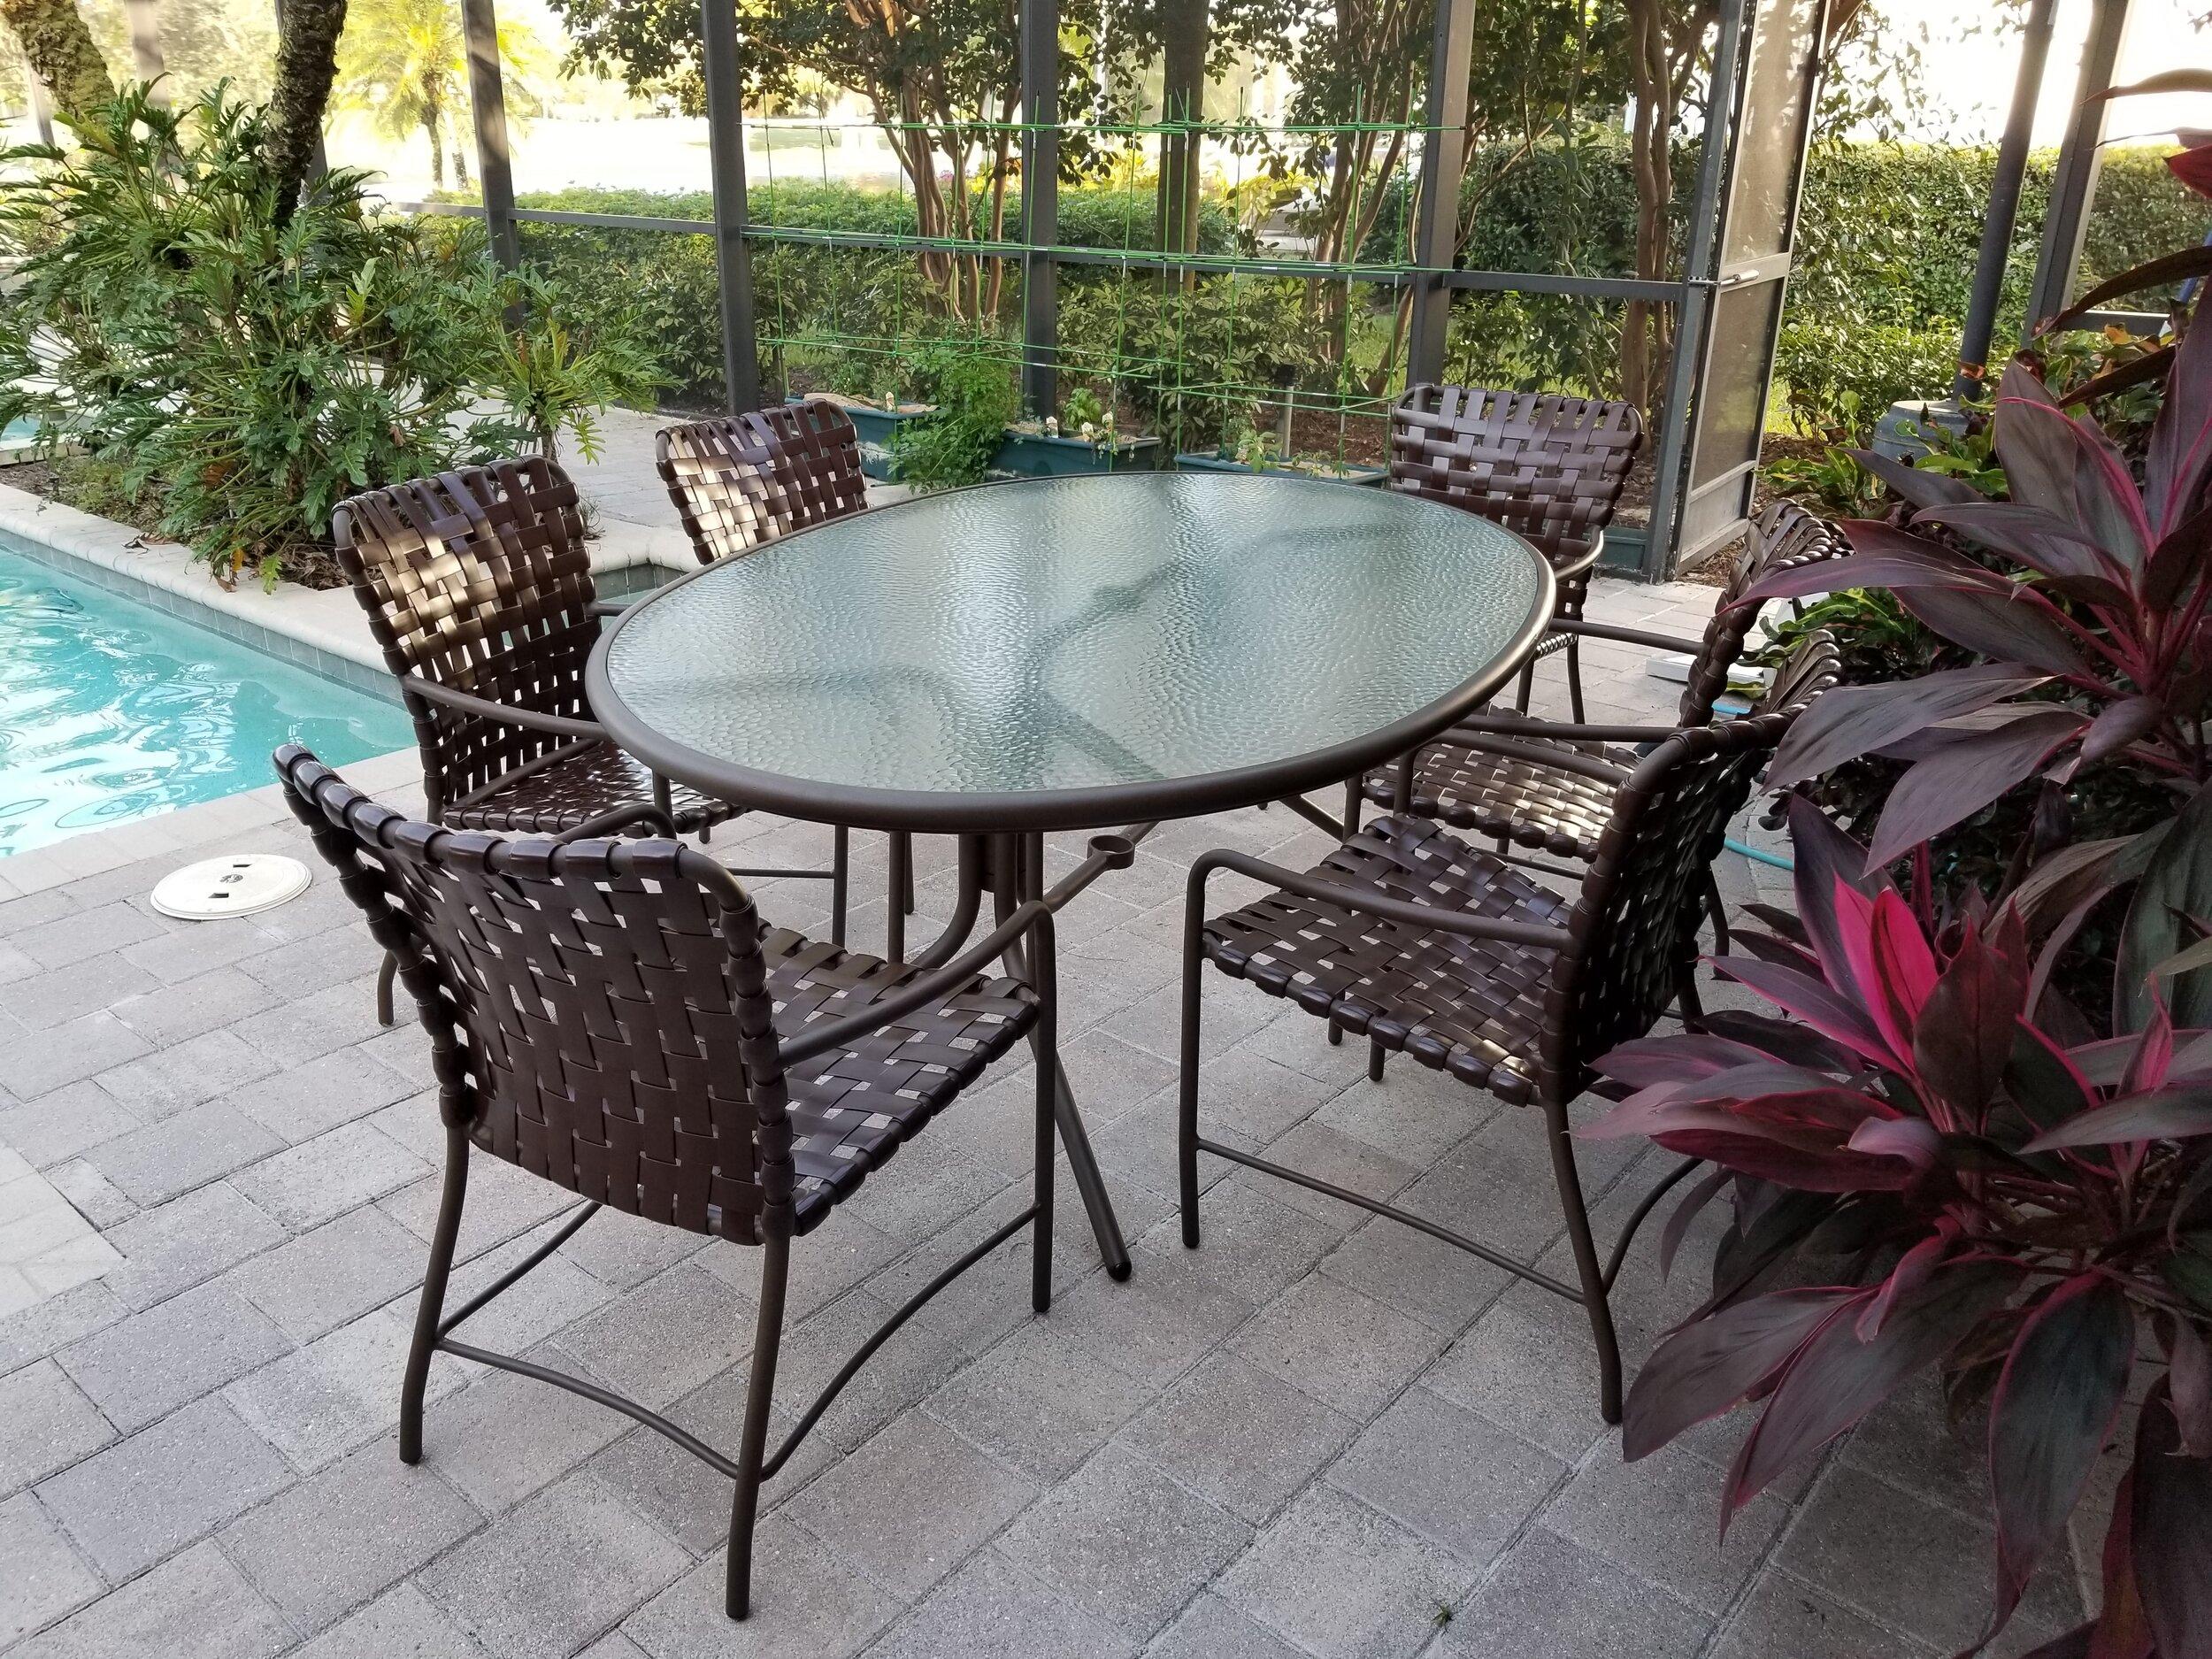 Blog Leisure Furniture Powder Coating Outdoor Furniture Restoration South West Florida Naples Fort Myers